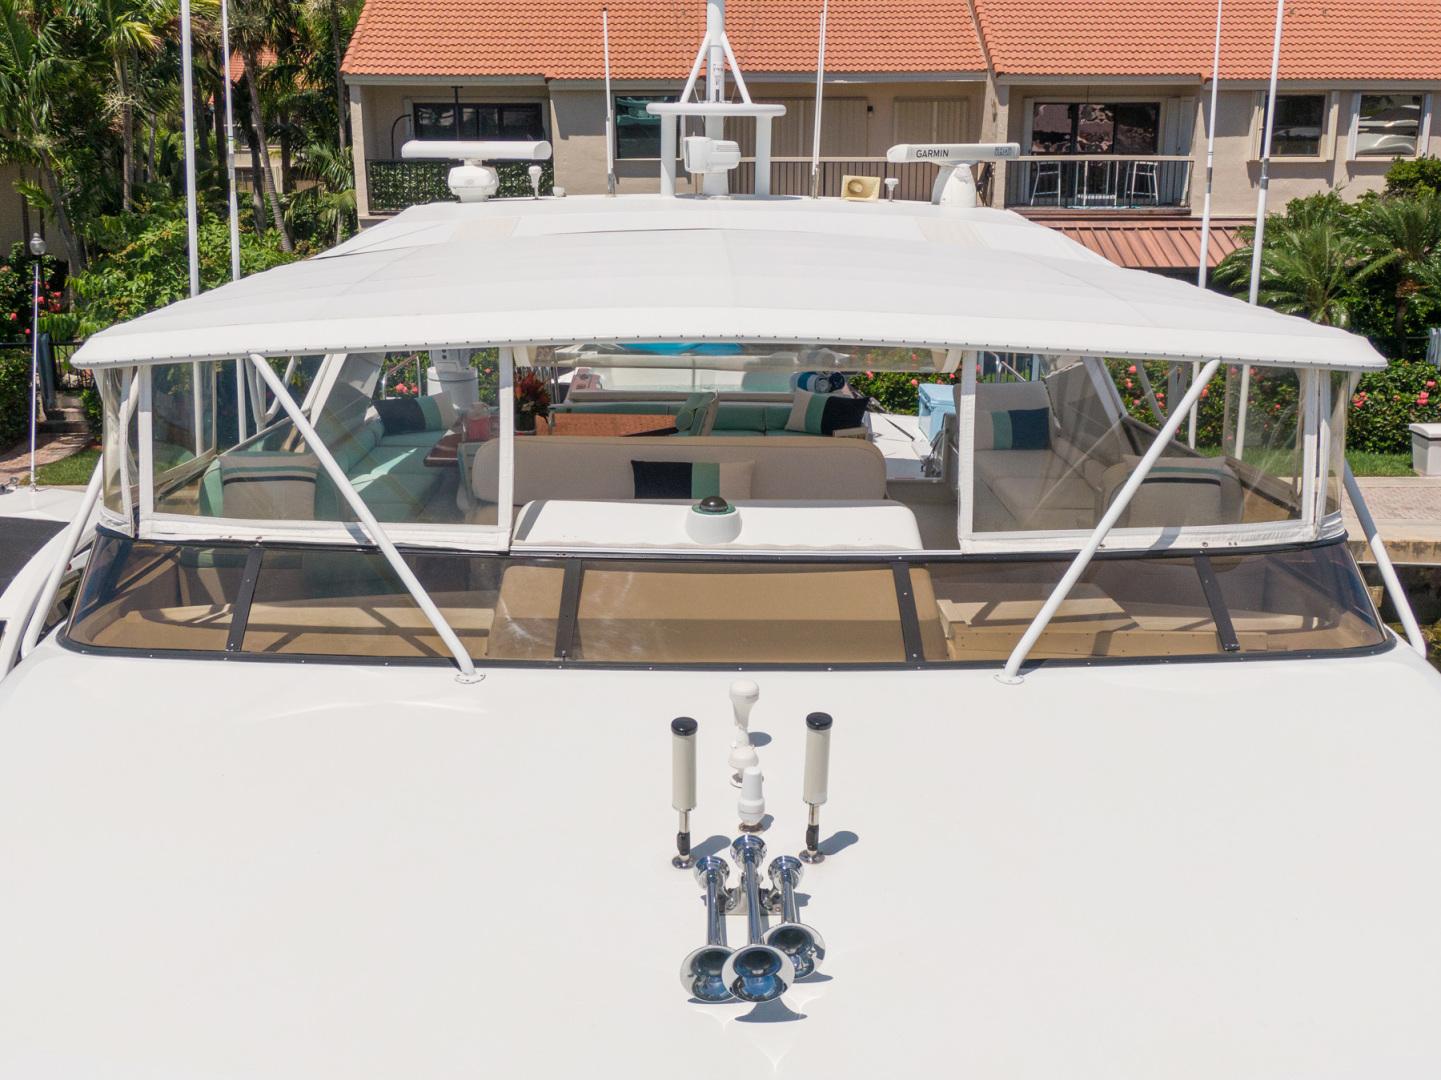 Broward-RPH 1996-Impulse Fort Lauderdale-Florida-United States-1478342 | Thumbnail